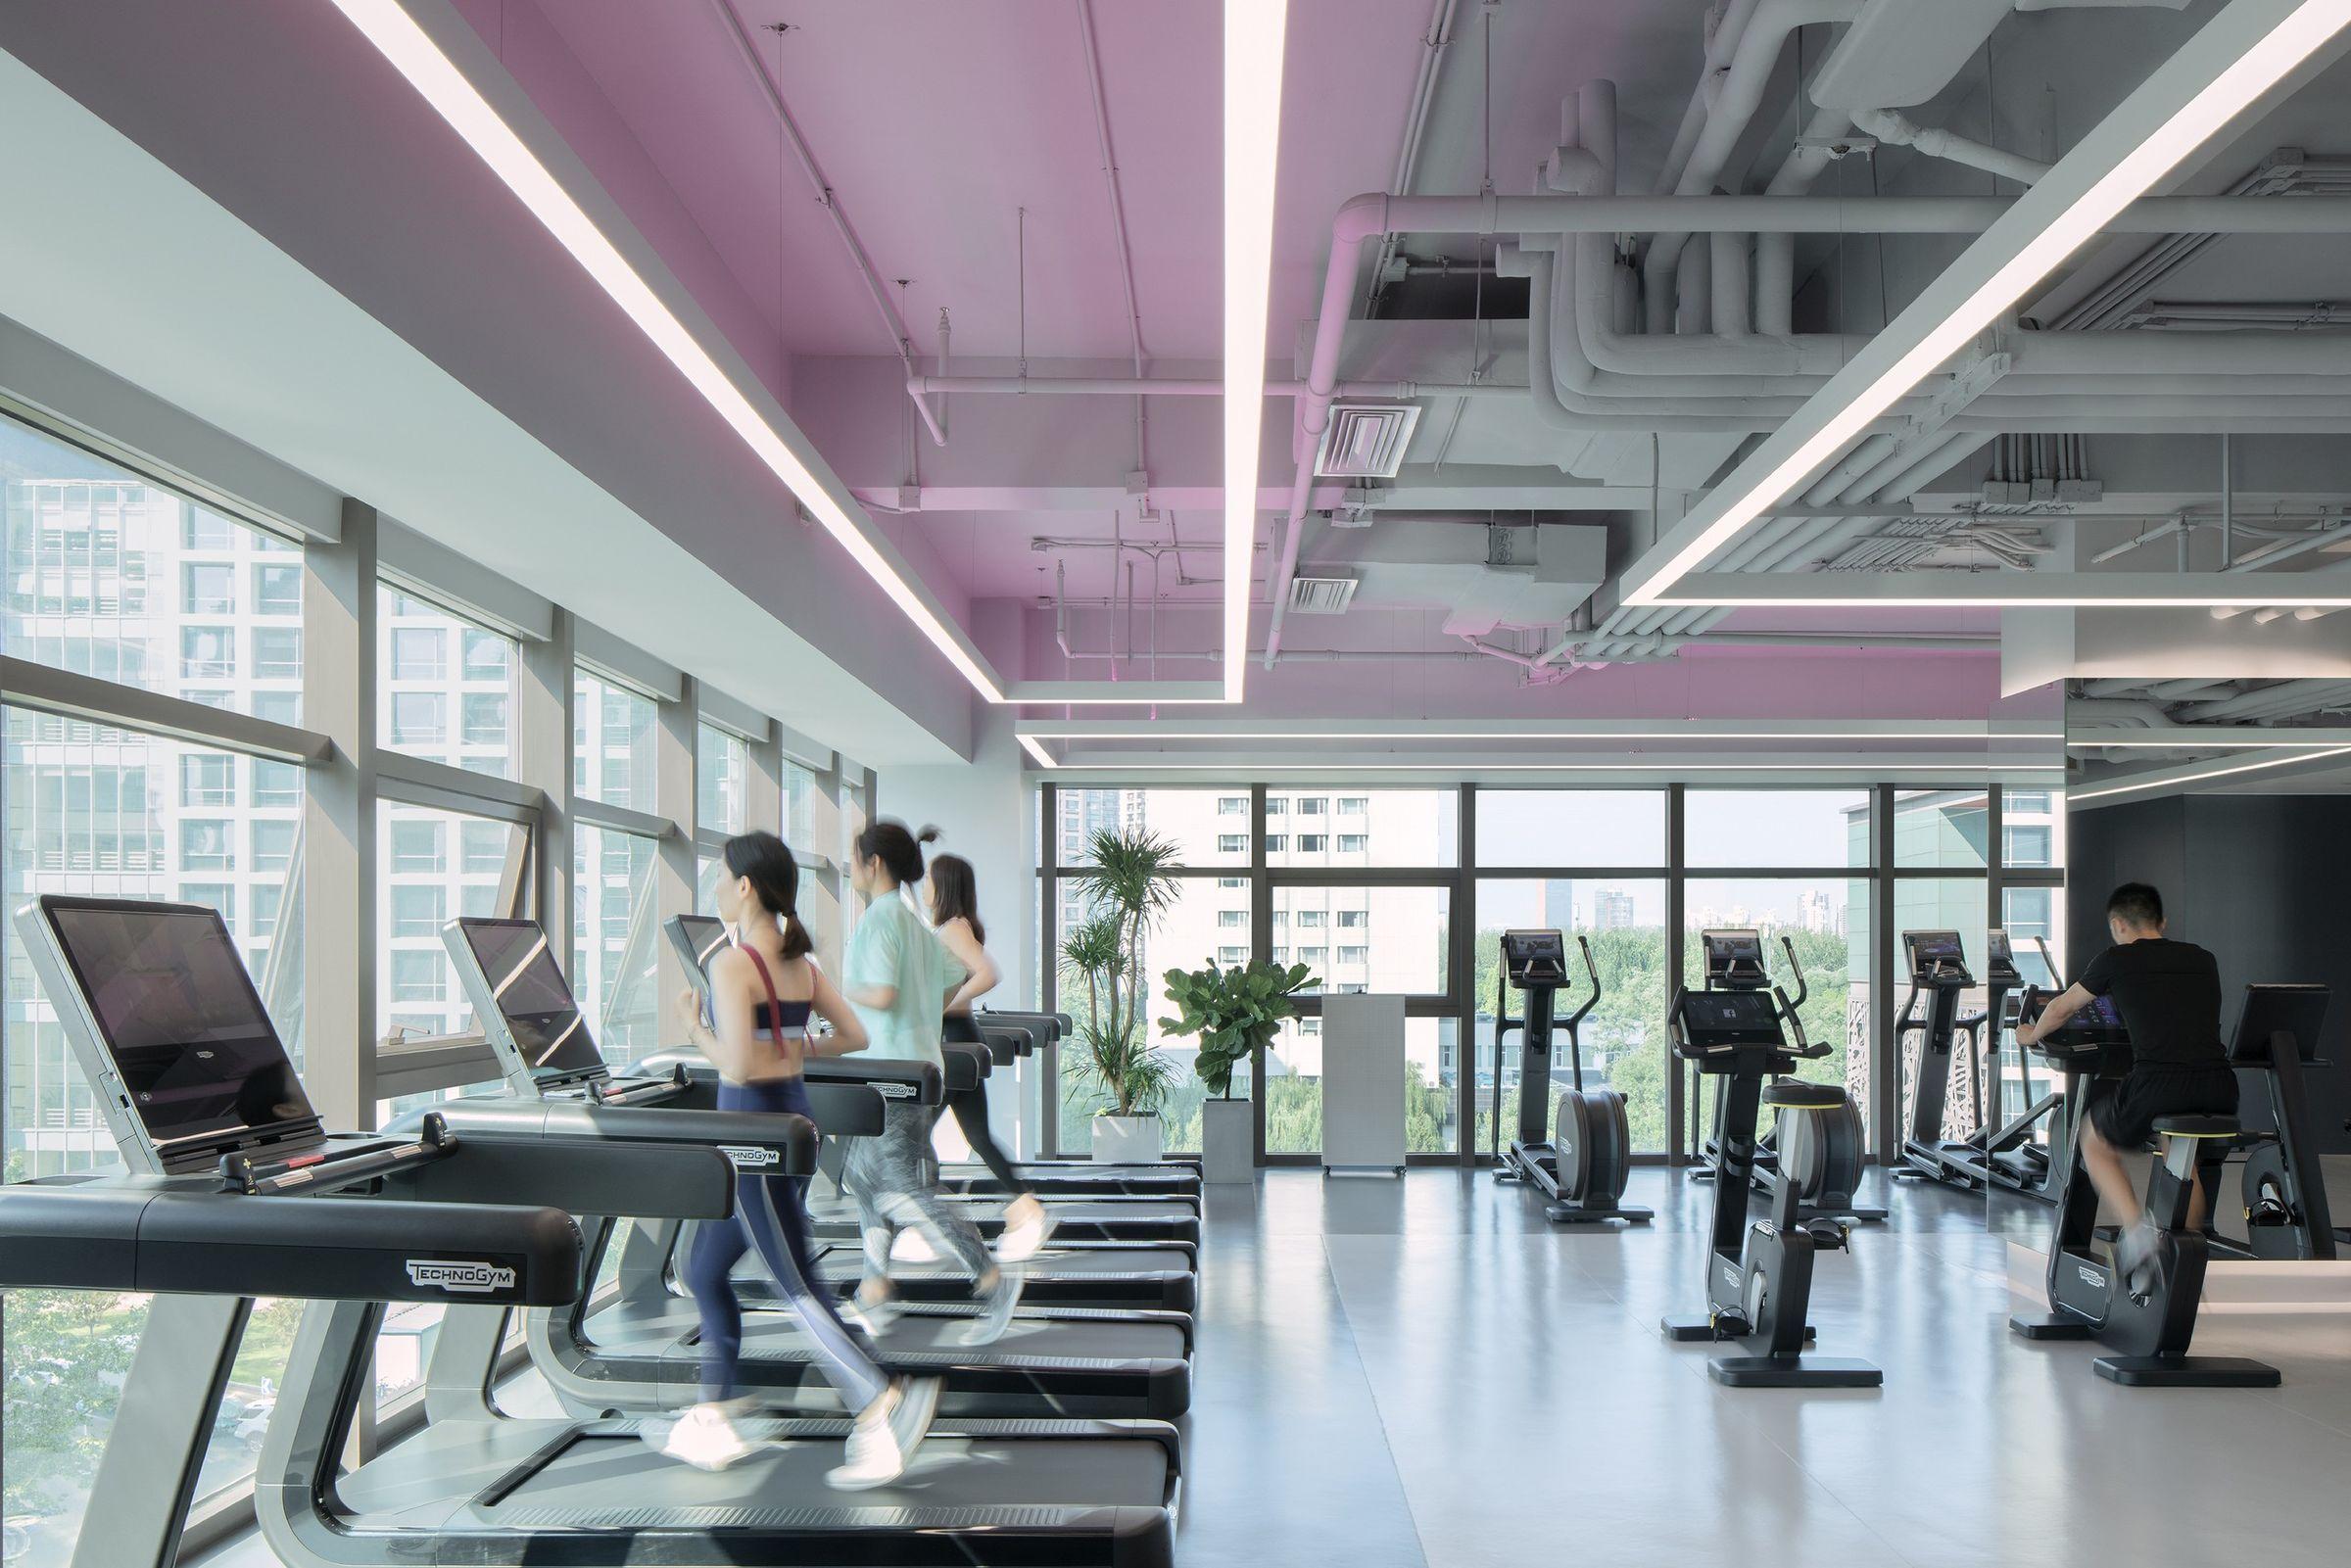 Ujoy Prime Fitness Gym Anyscale Archello Gym Workouts Gym Fitness